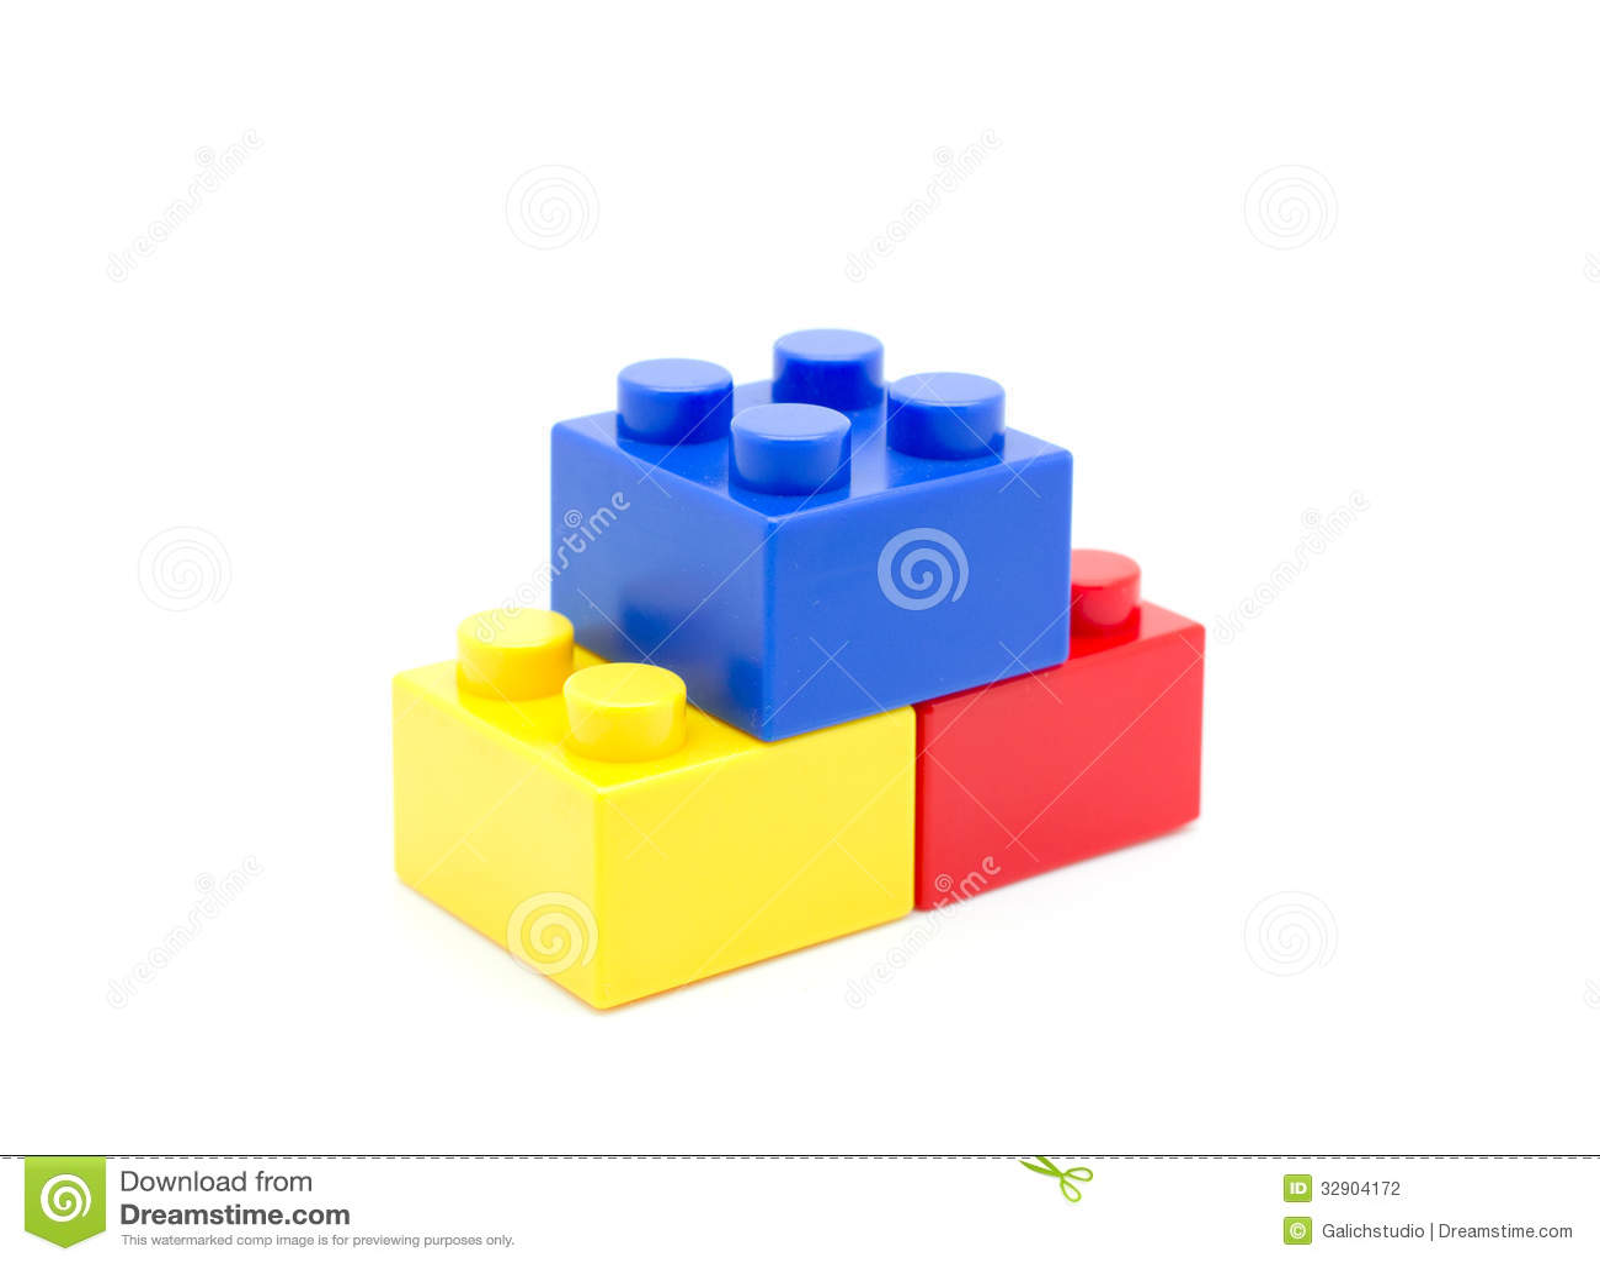 Plastic Building Blocks On White Background Stock